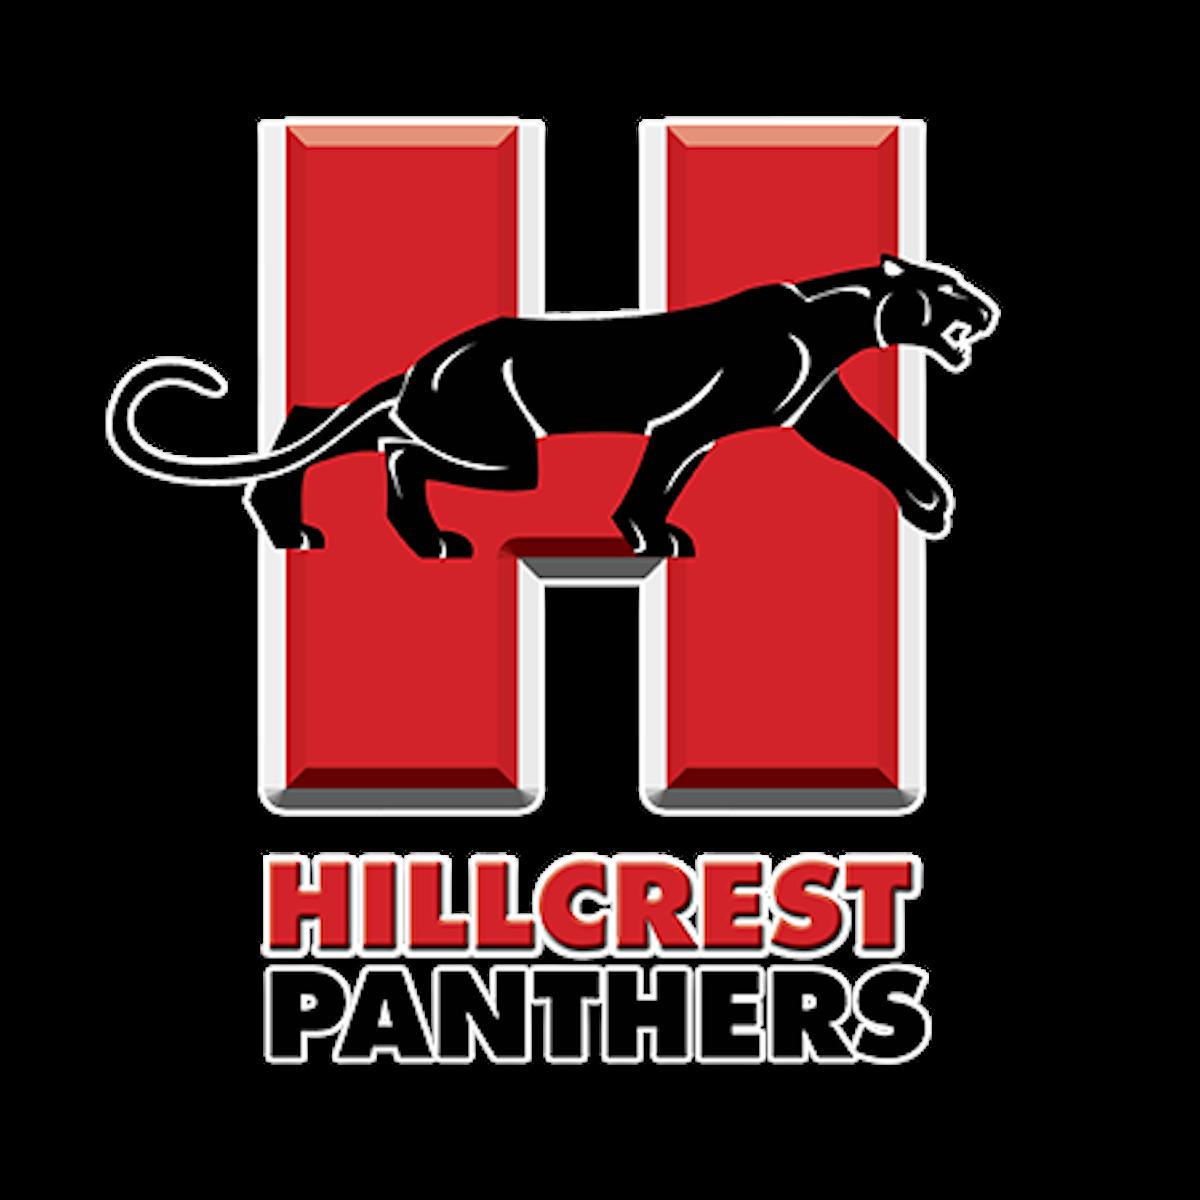 Hillcrest Panthers | SportsDayHS.com